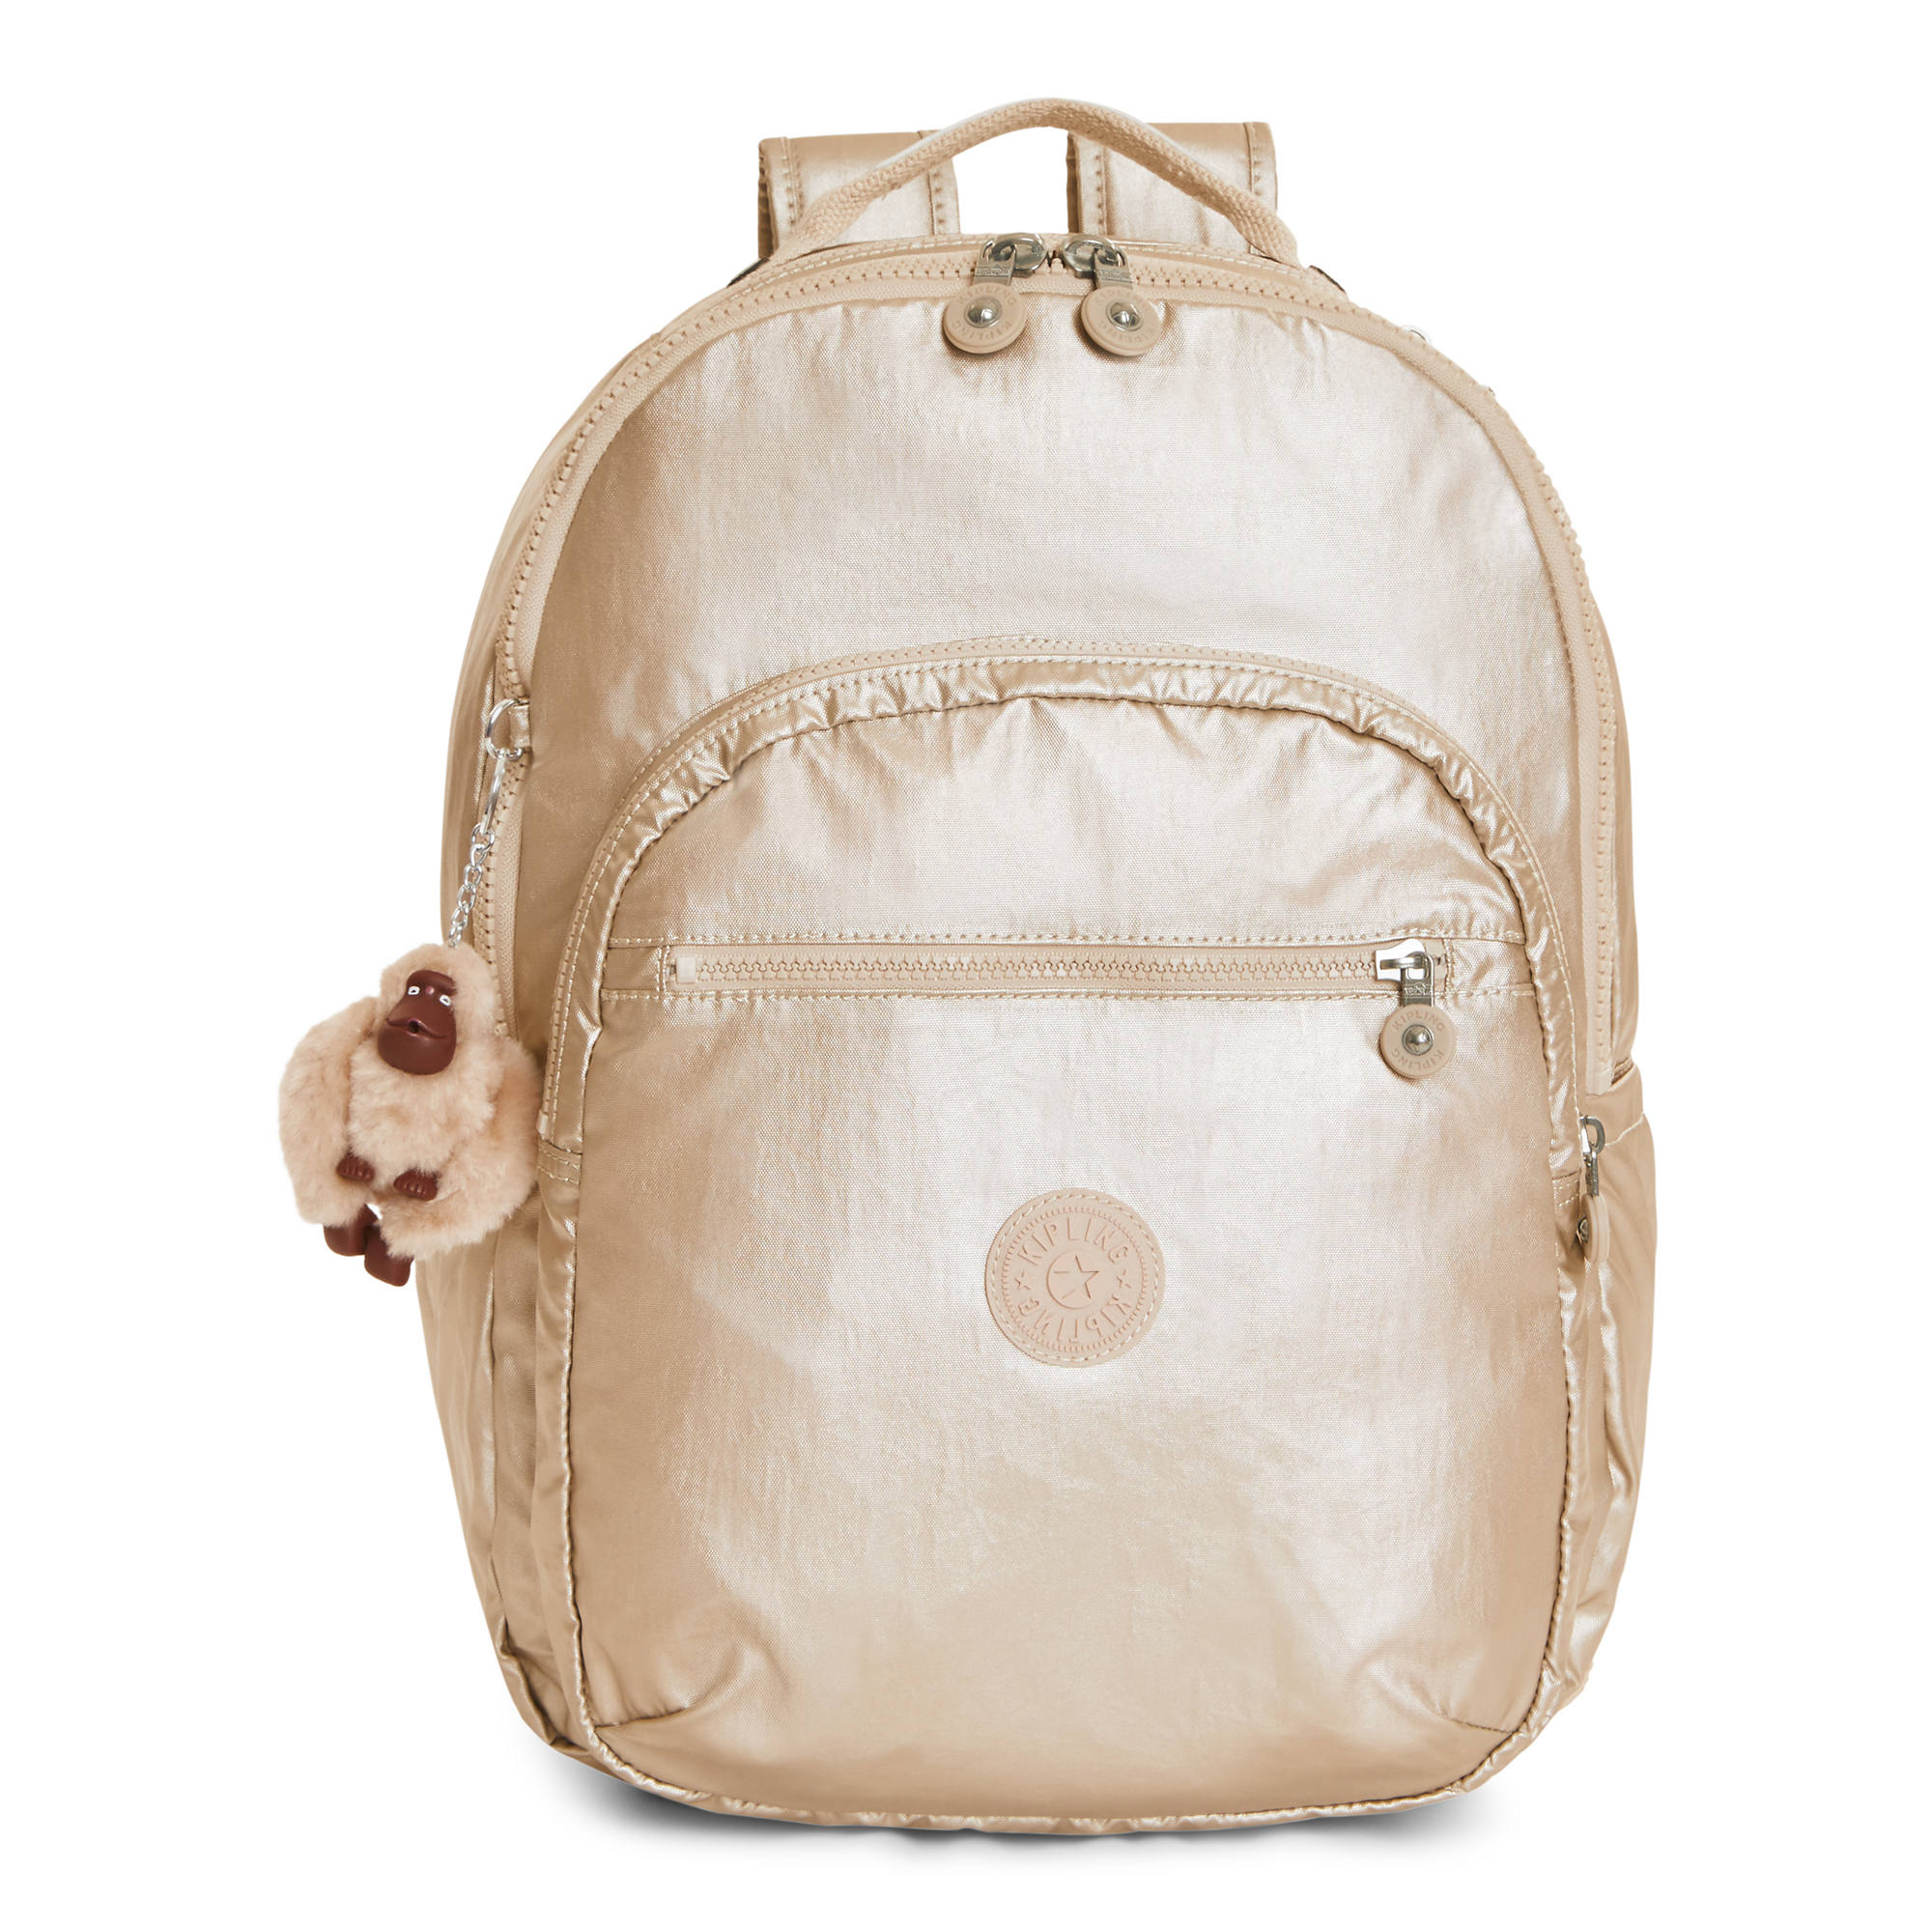 Ejercer Pendiente Jarra  Kipling USA: Which Kipling Backpack is your favorite? - Poll | Question  Everything